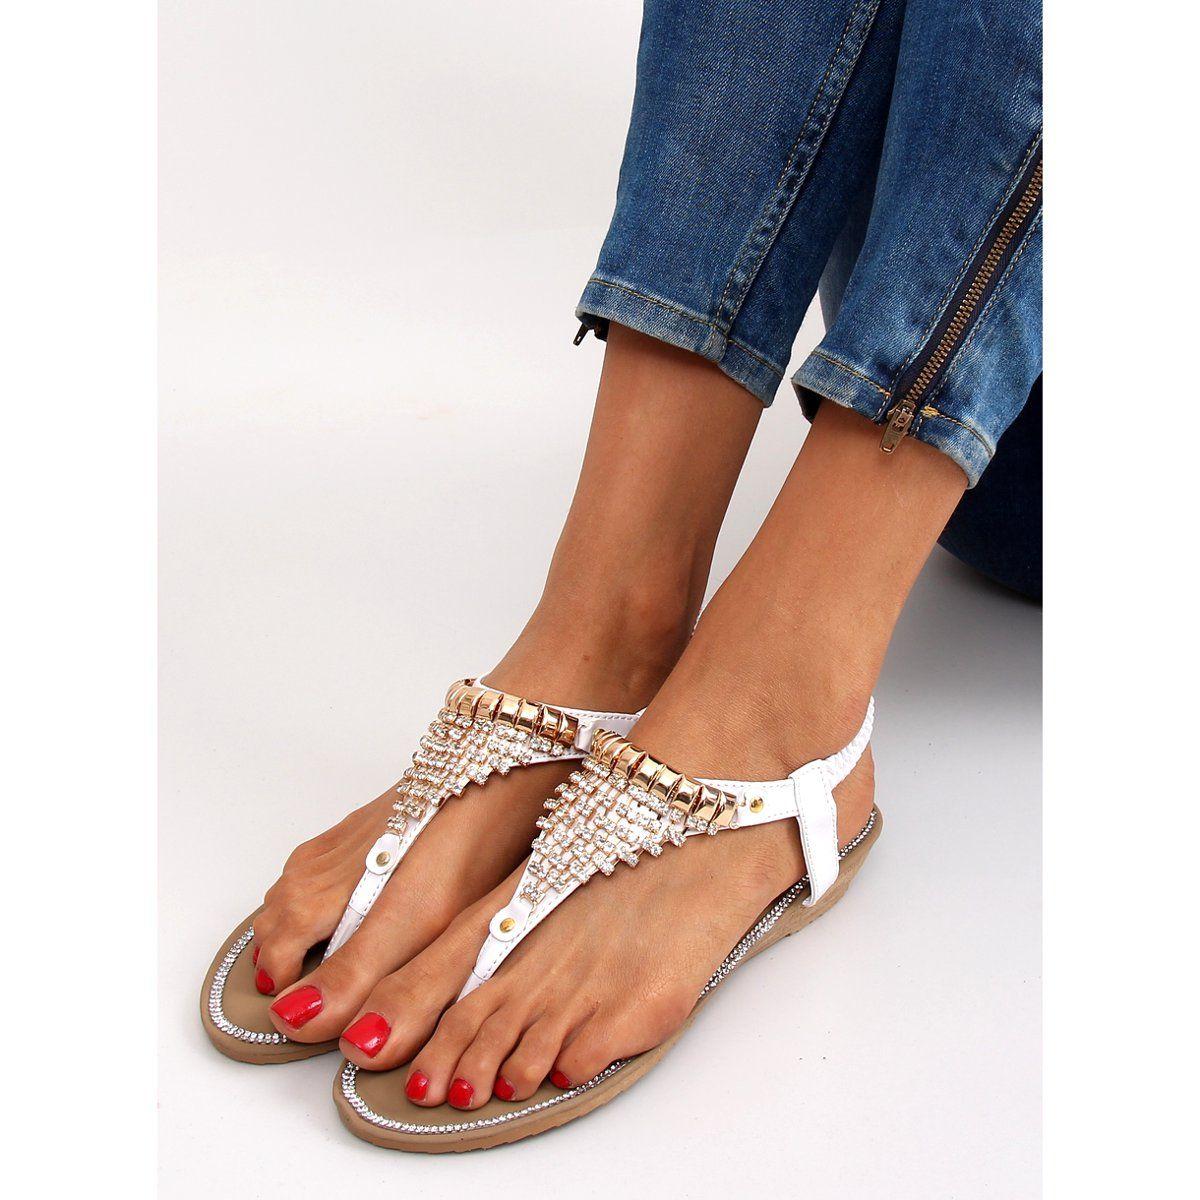 Sandalki Bogato Zdobione 2017 32 White Biale Sandals Shoes Fashion